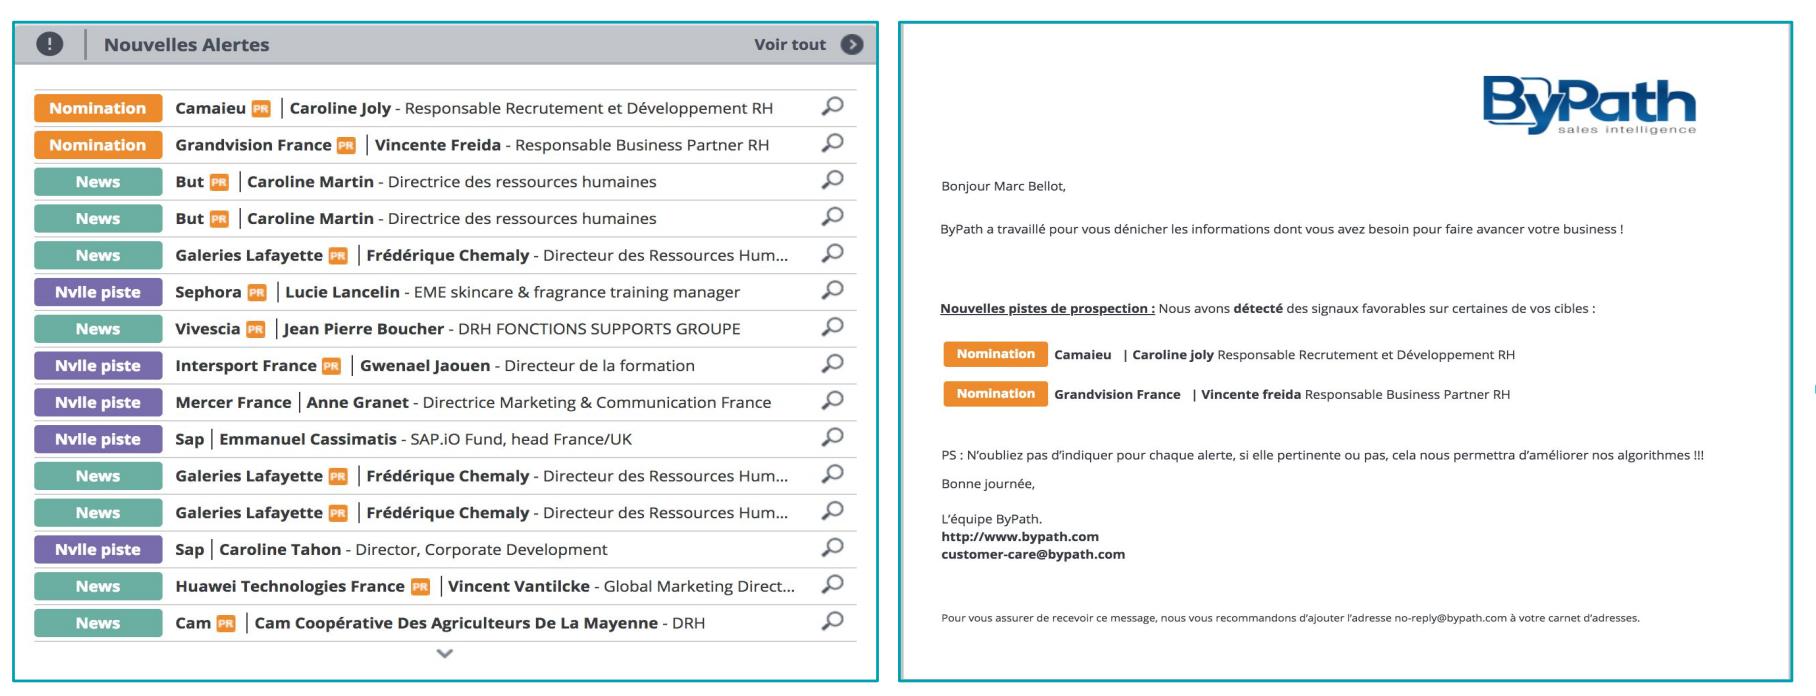 Bypath Insights - outils de vente